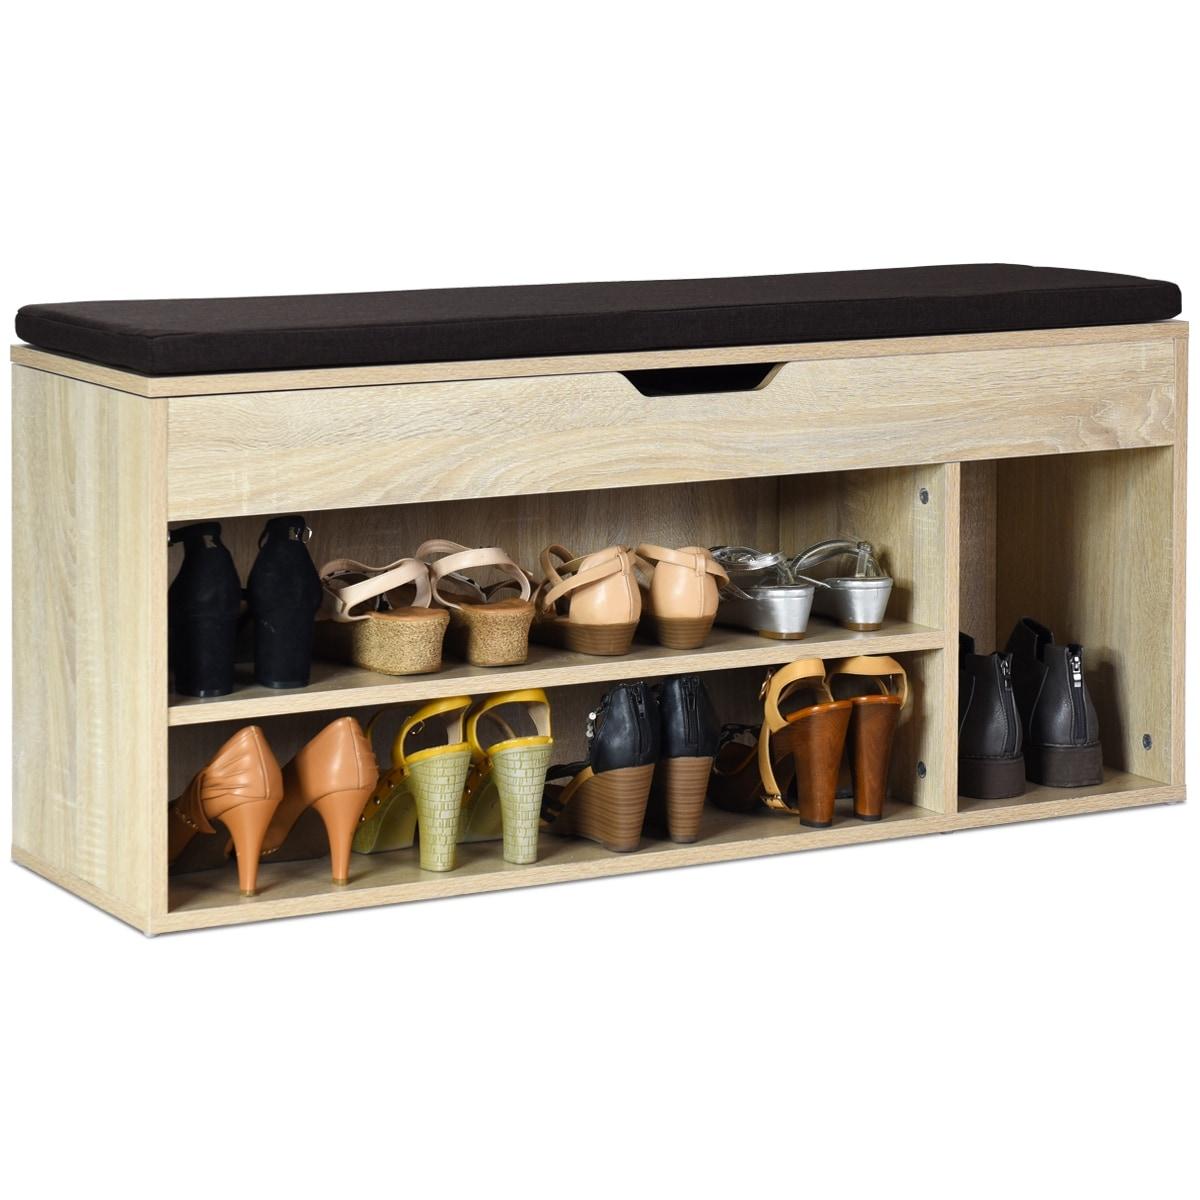 Picture of: Costway Wooden Rack Shoes Bench W Storage Shelf Upholstered Shoe Rack Entryway Hallway Wooden Color Overstock 28634498